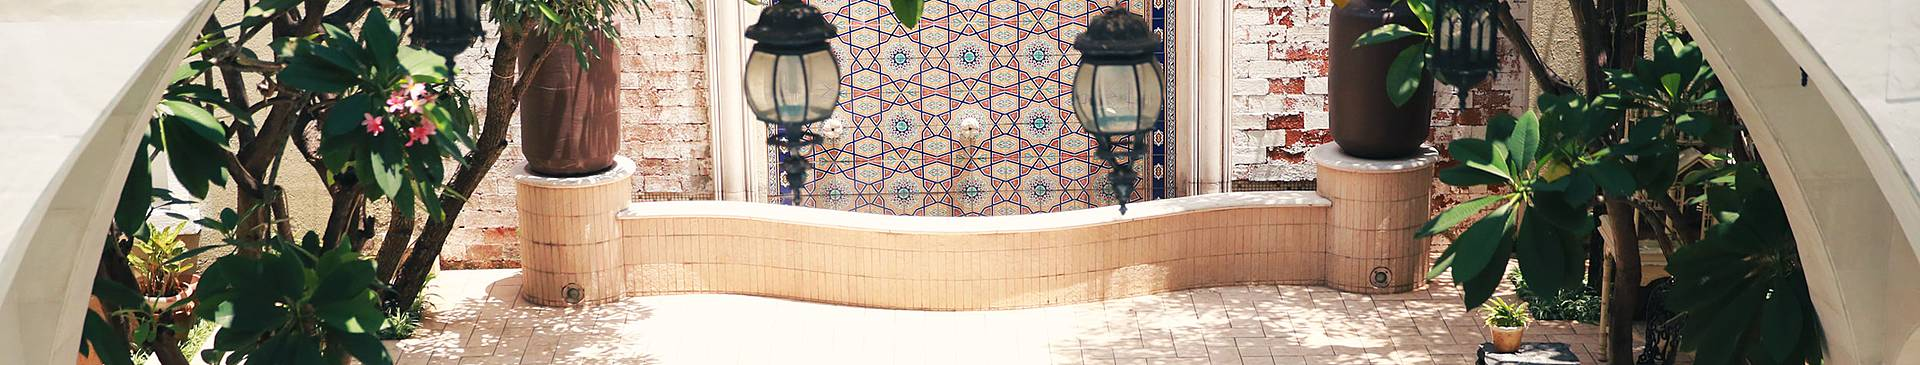 Circuits Charme et Luxe au Maroc